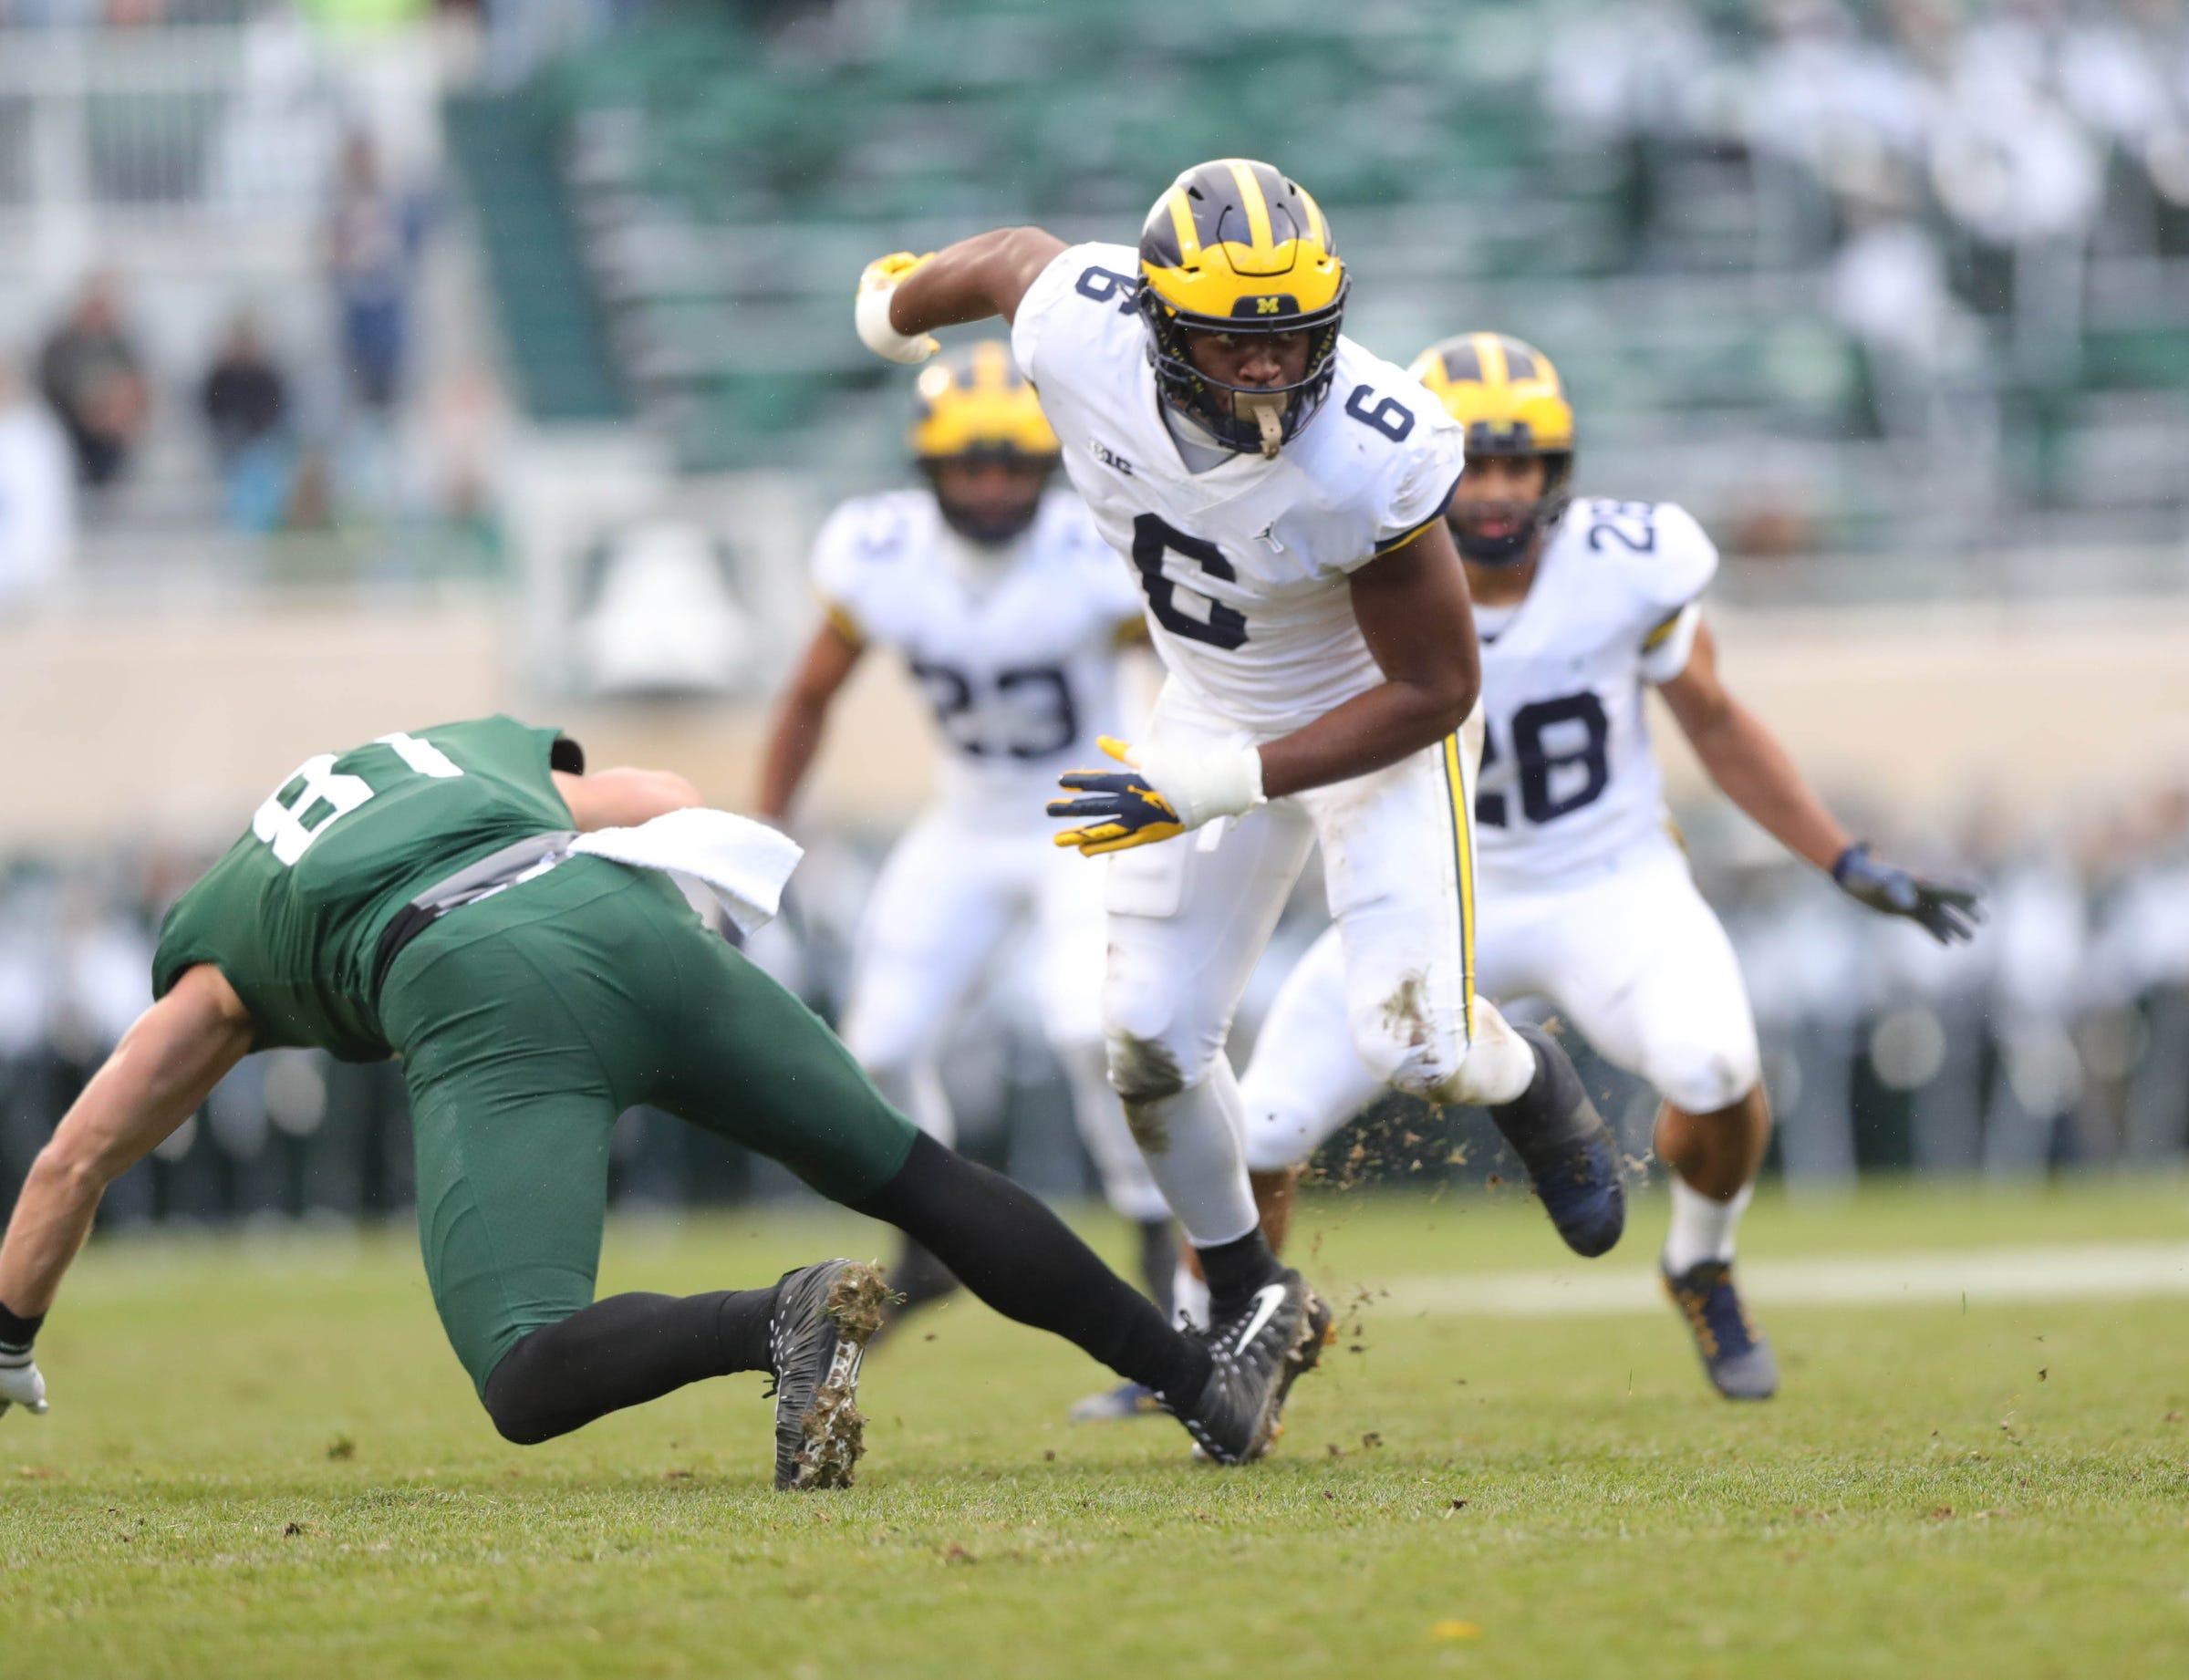 Michigan linebacker Josh Uche rushes Michigan State QB Brian Lewerke during the first half in Spartan Stadium on Saturday, Oct. 20, 2018.